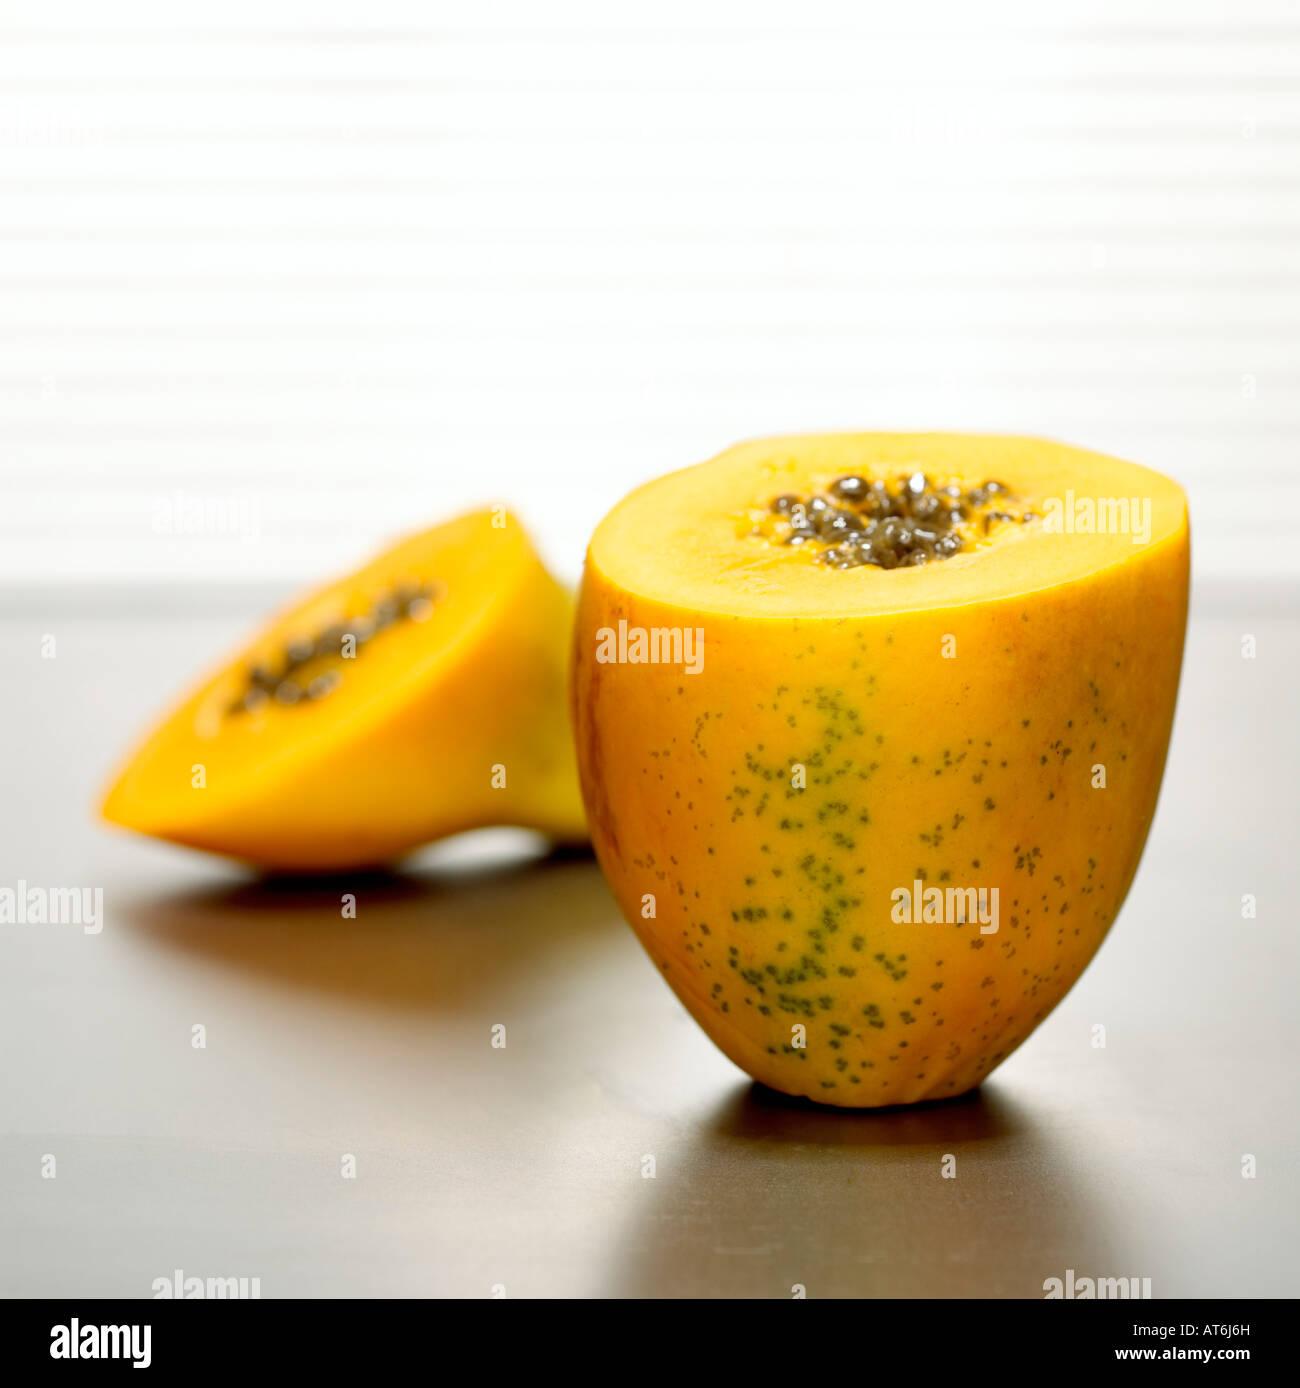 Sliced papaya, close-up - Stock Image